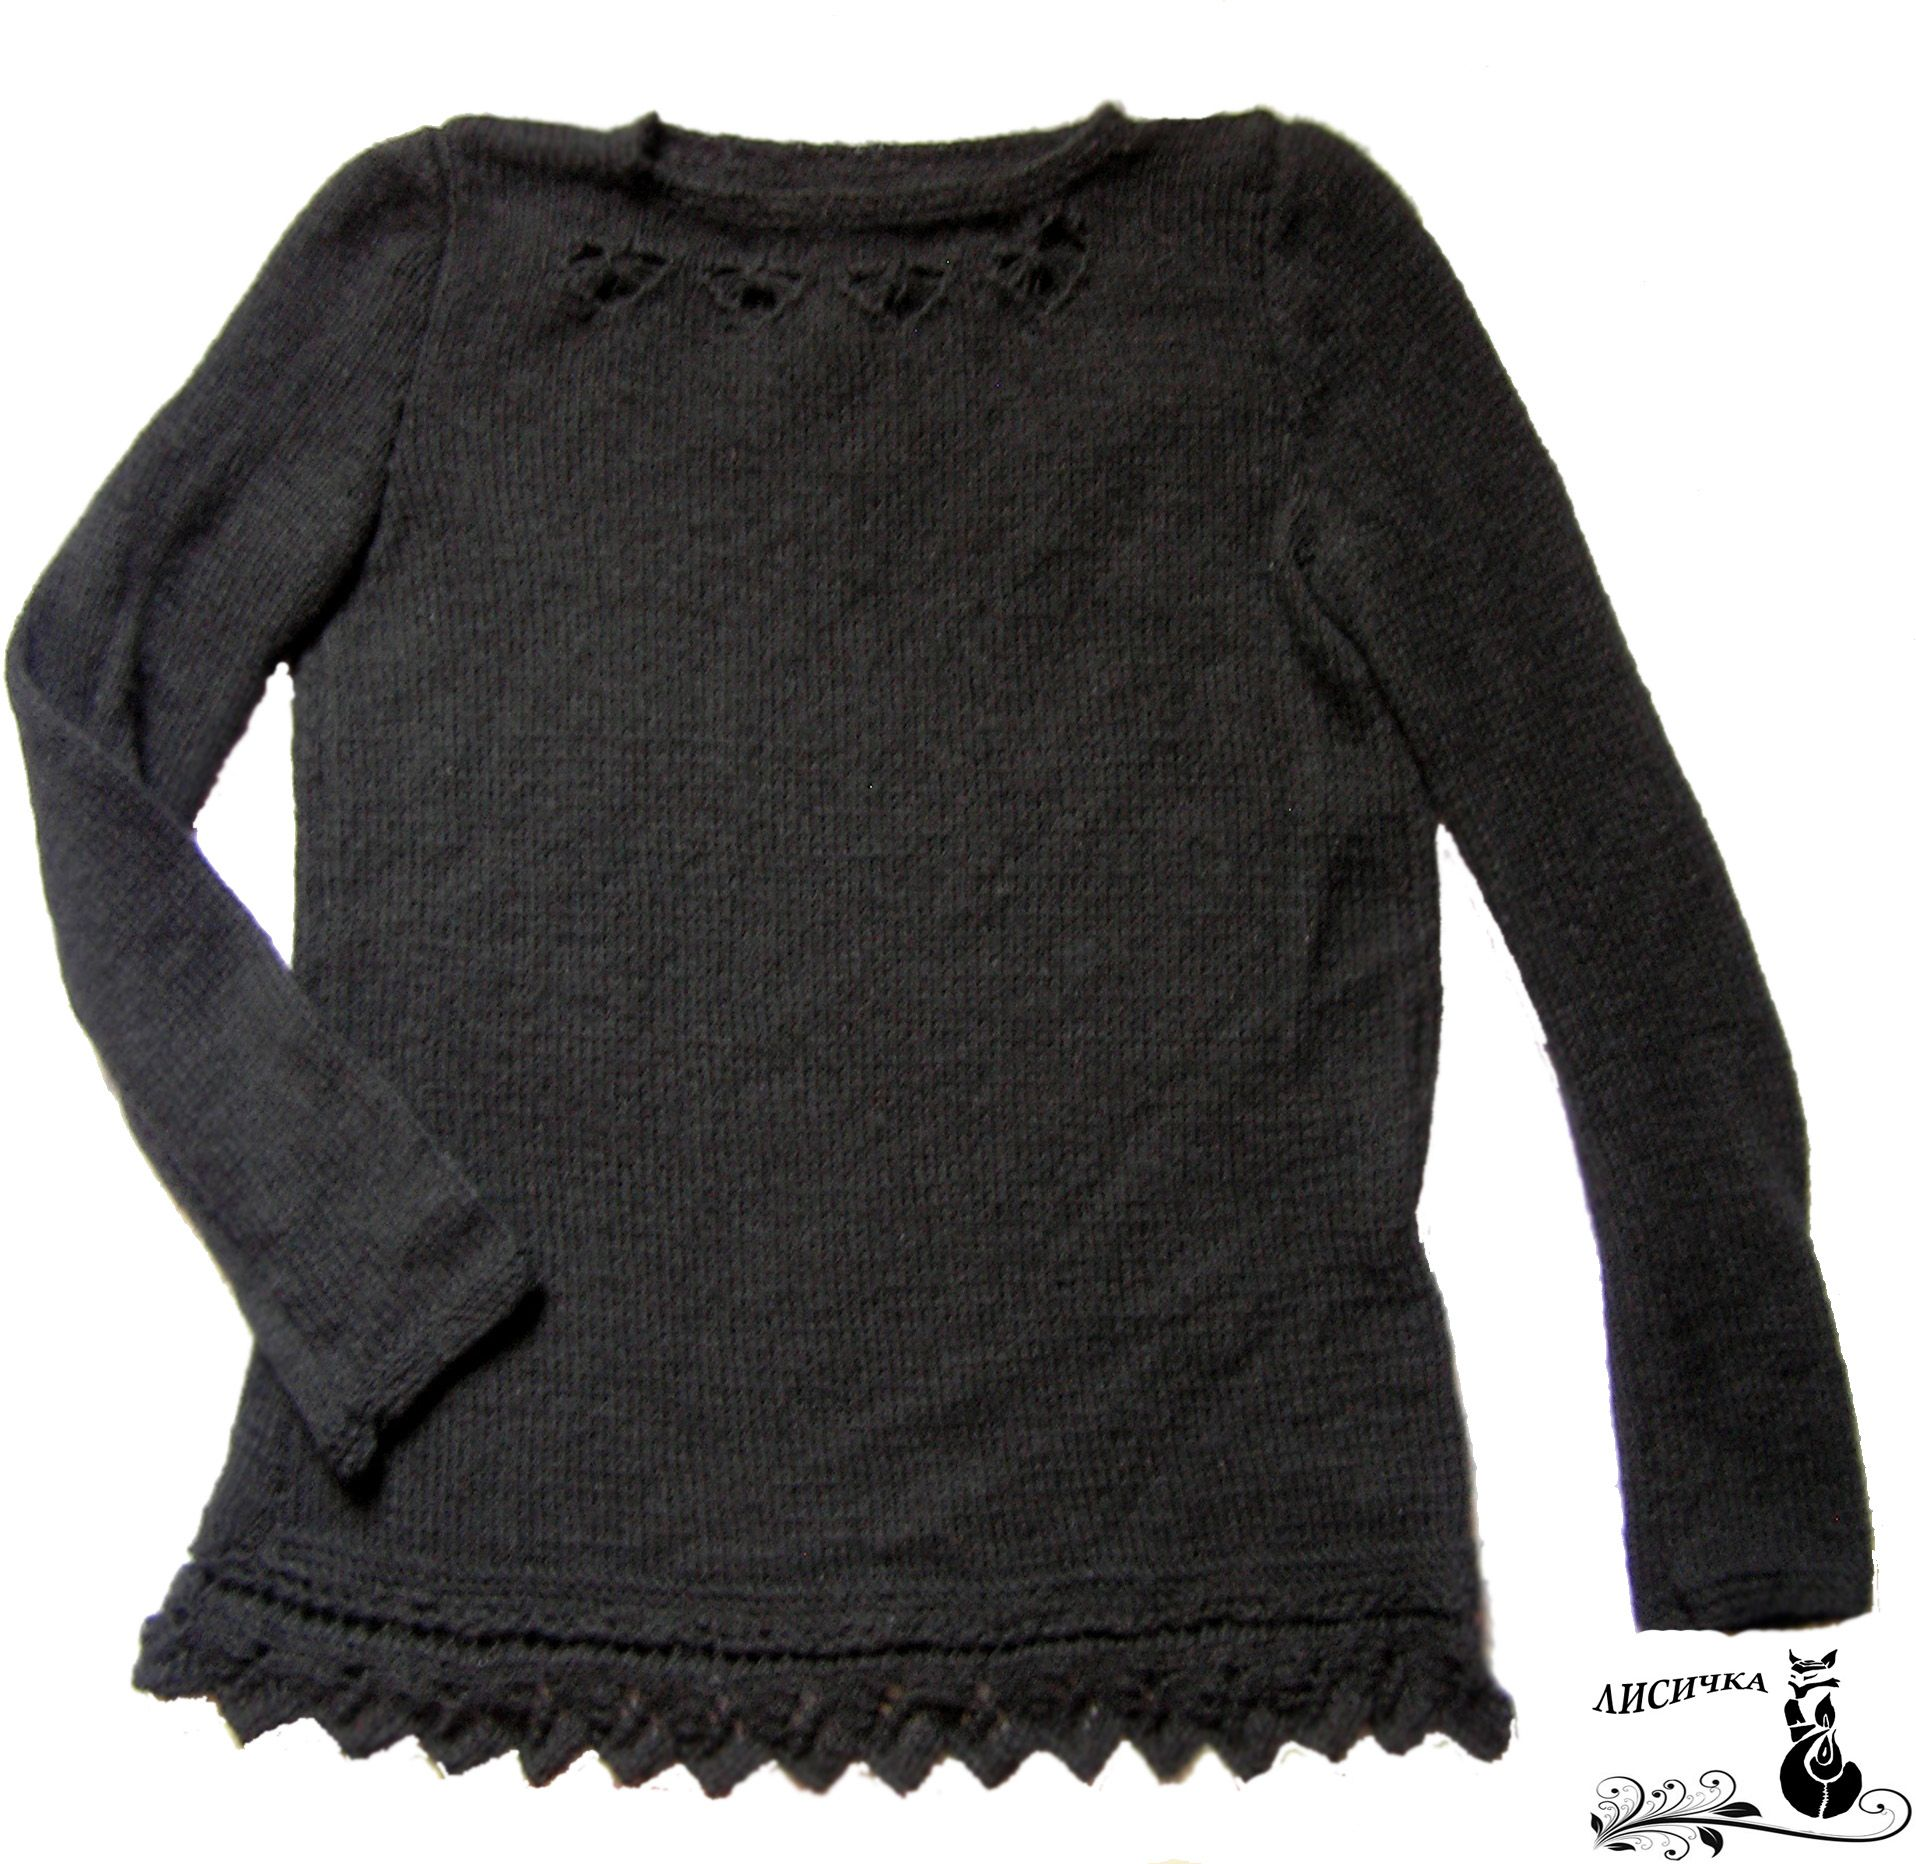 clothes women blouse knitting black